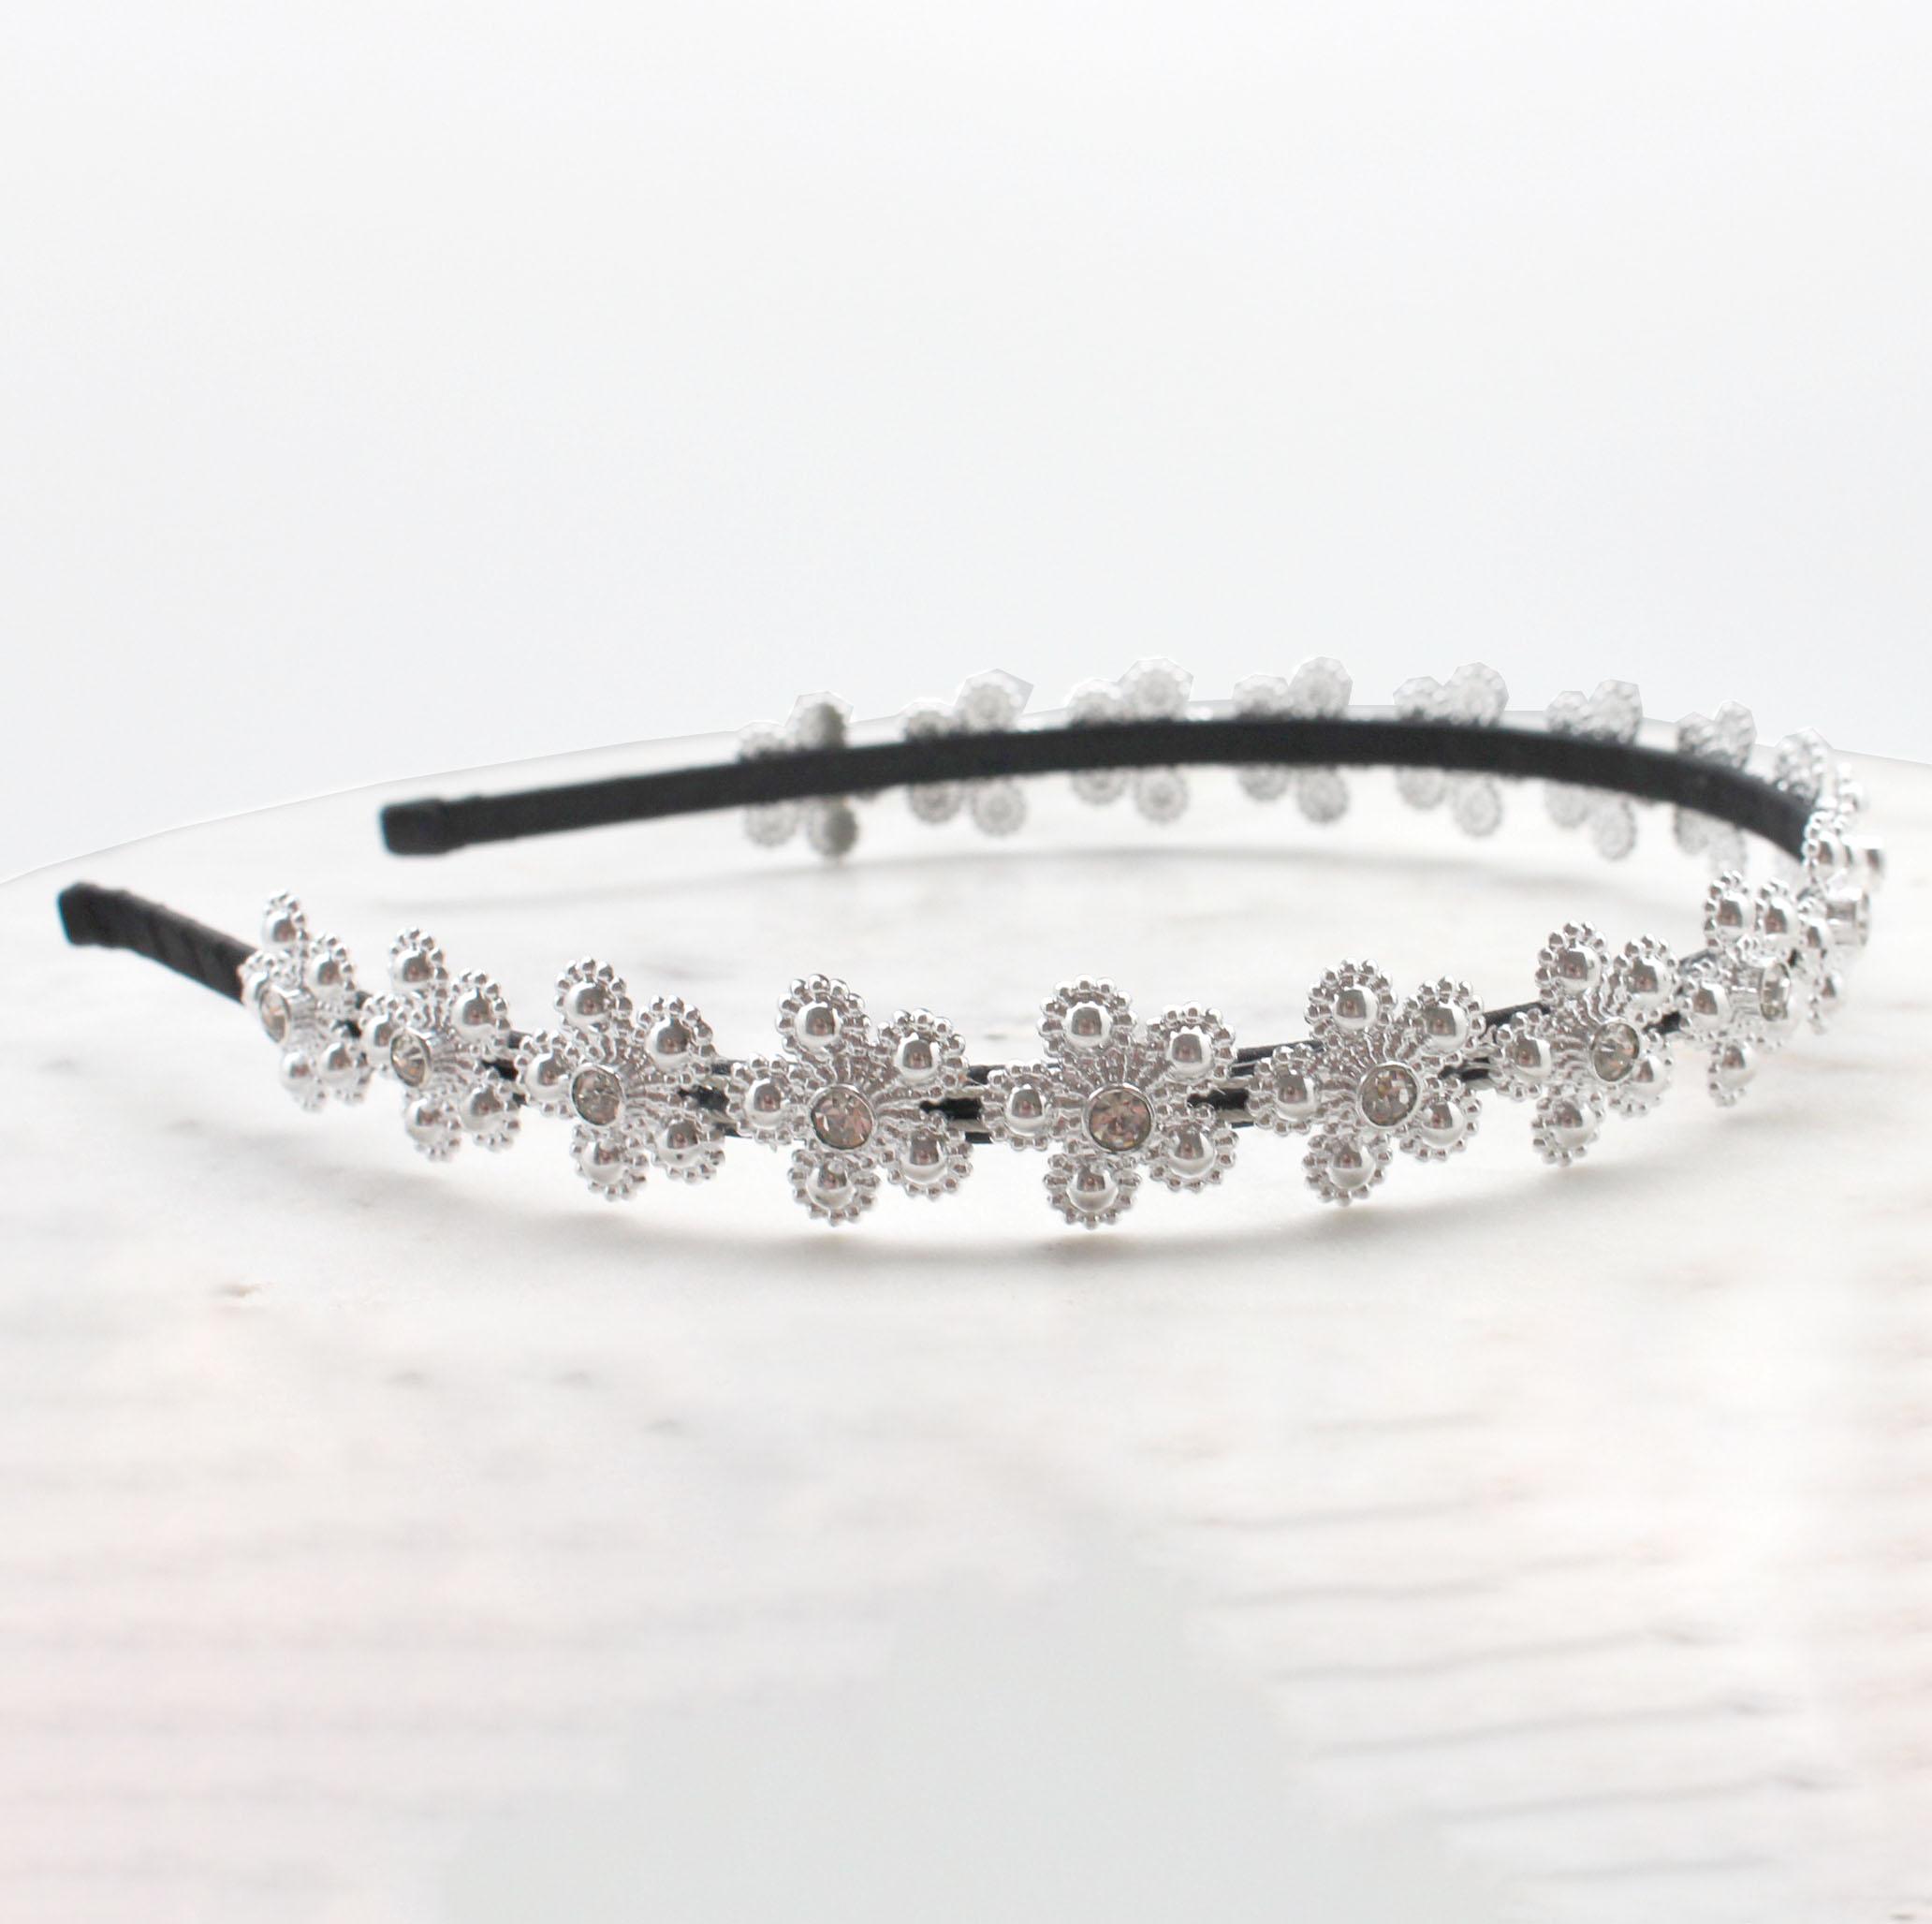 Flower power headband best of everything online shopping flower power headband izmirmasajfo